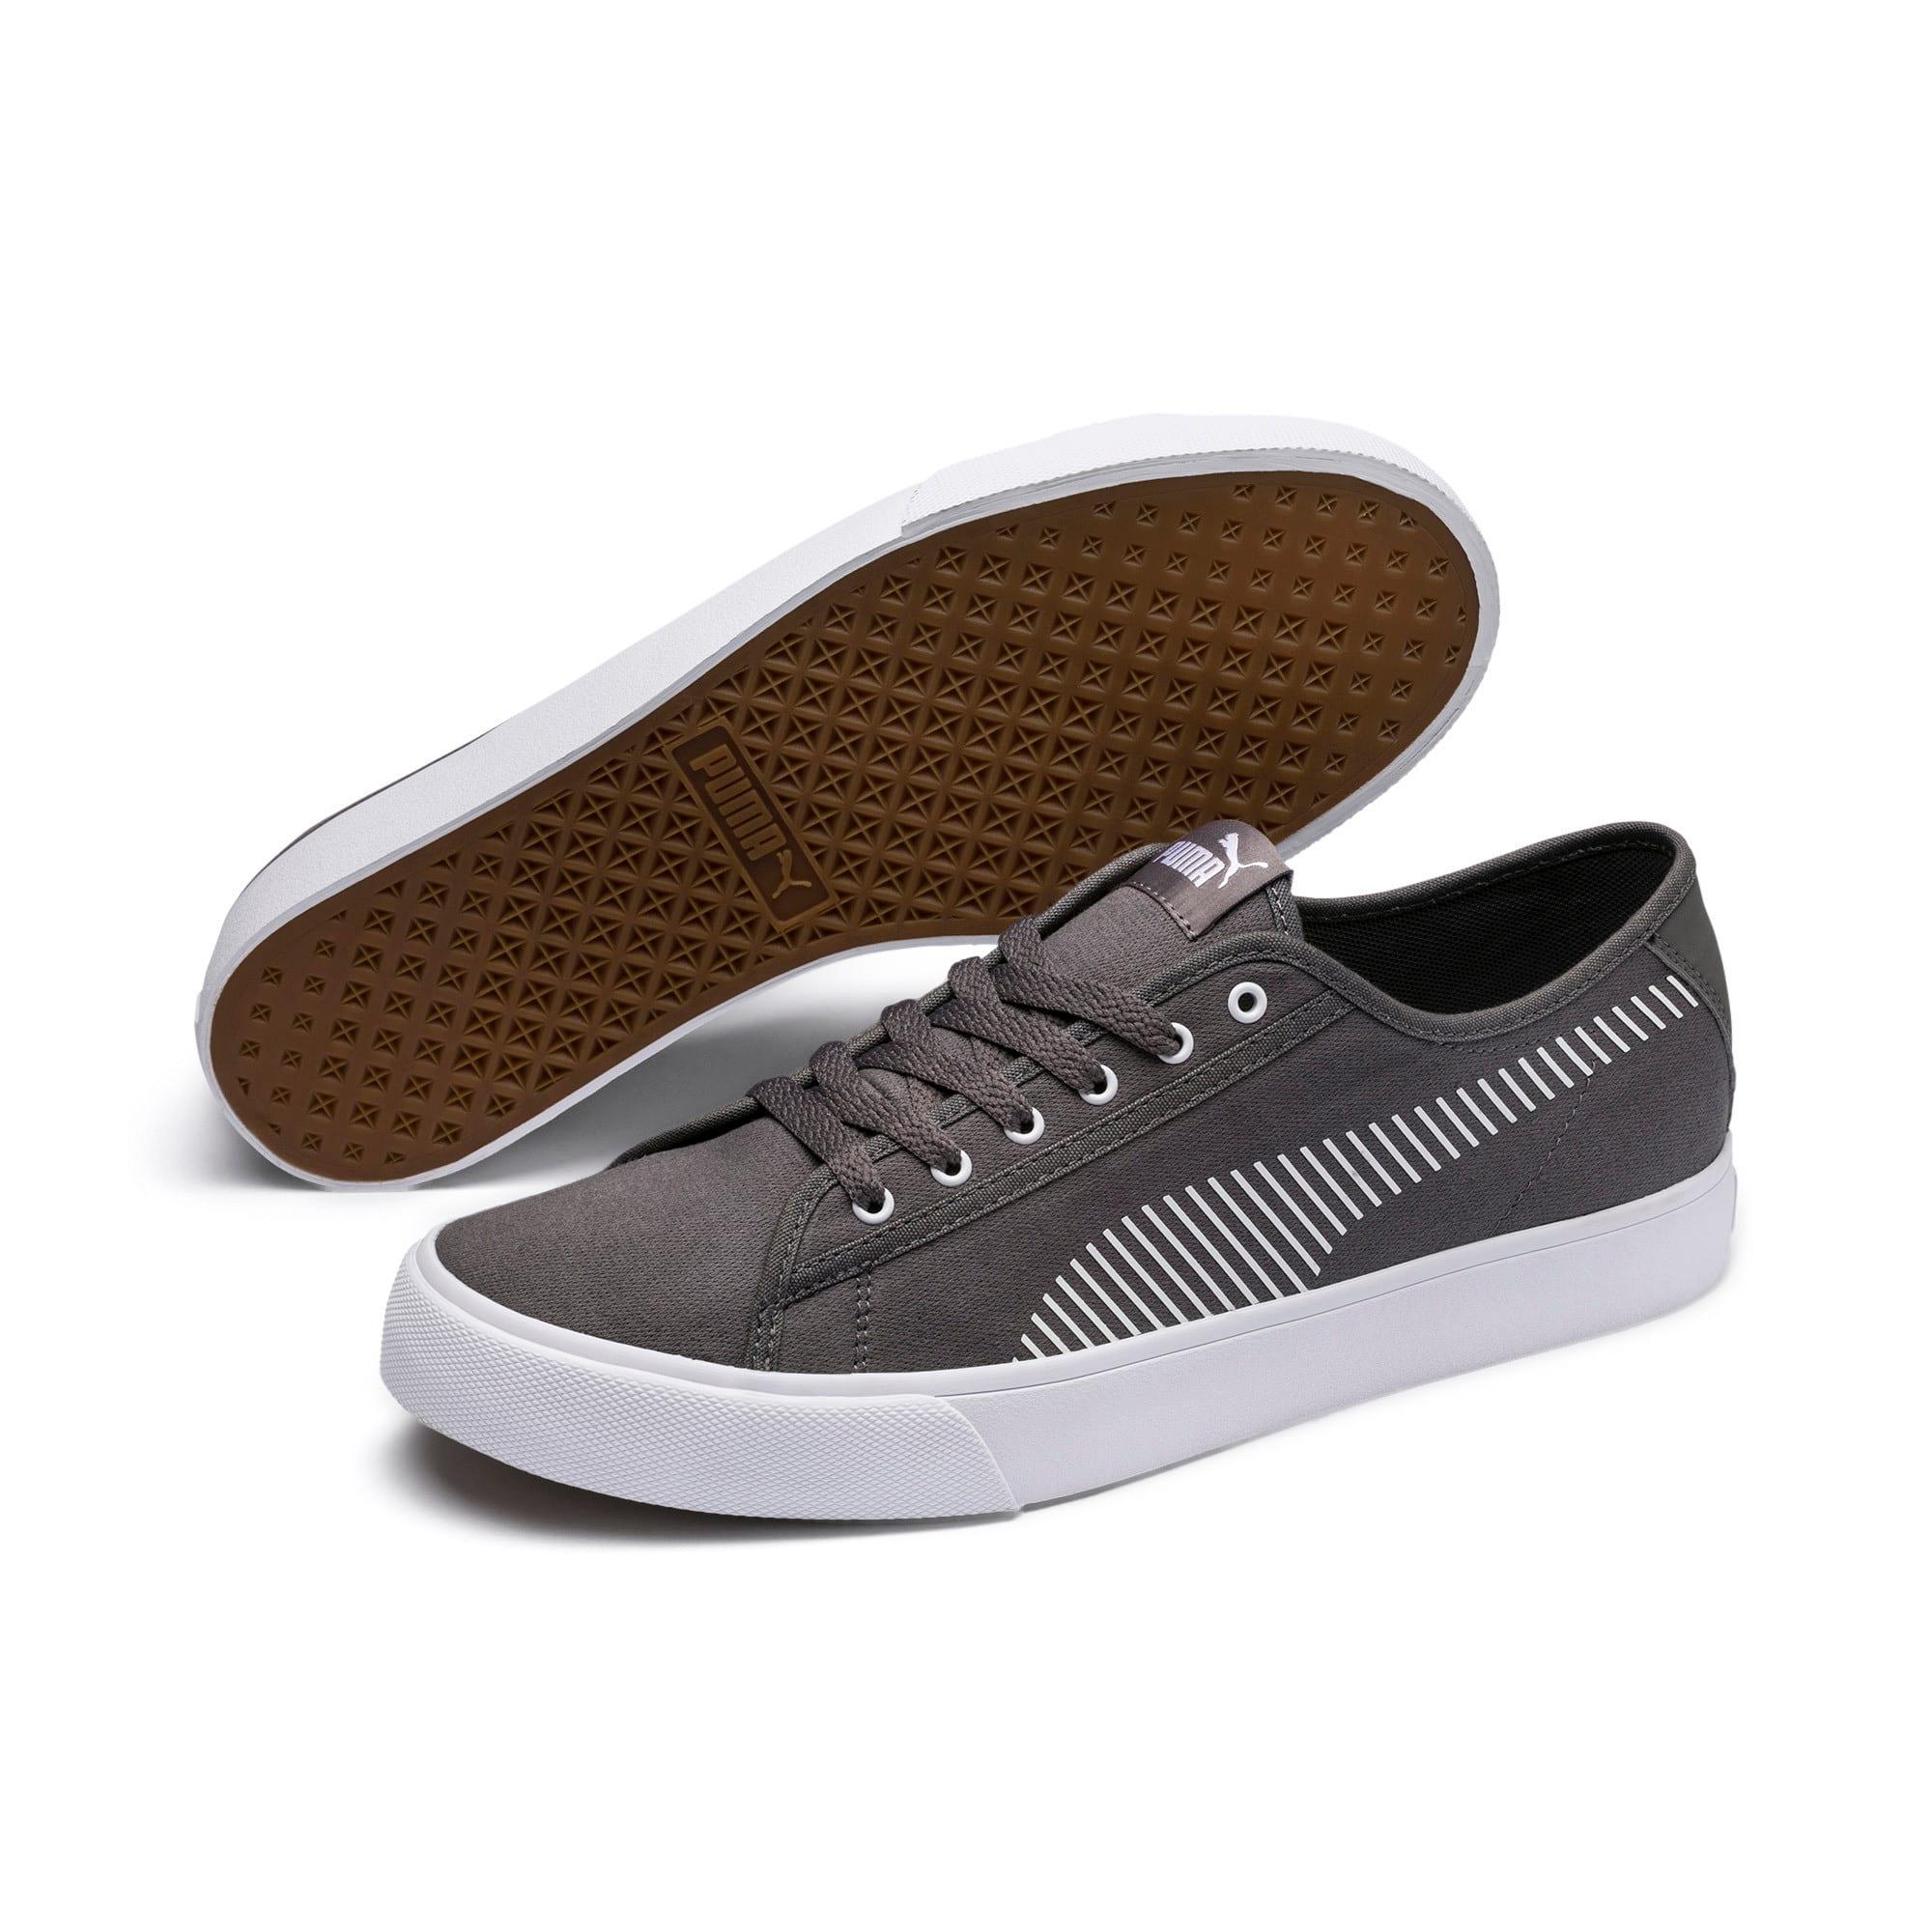 Thumbnail 2 of Bari Sneakers, Charcoal Gray-Puma White, medium